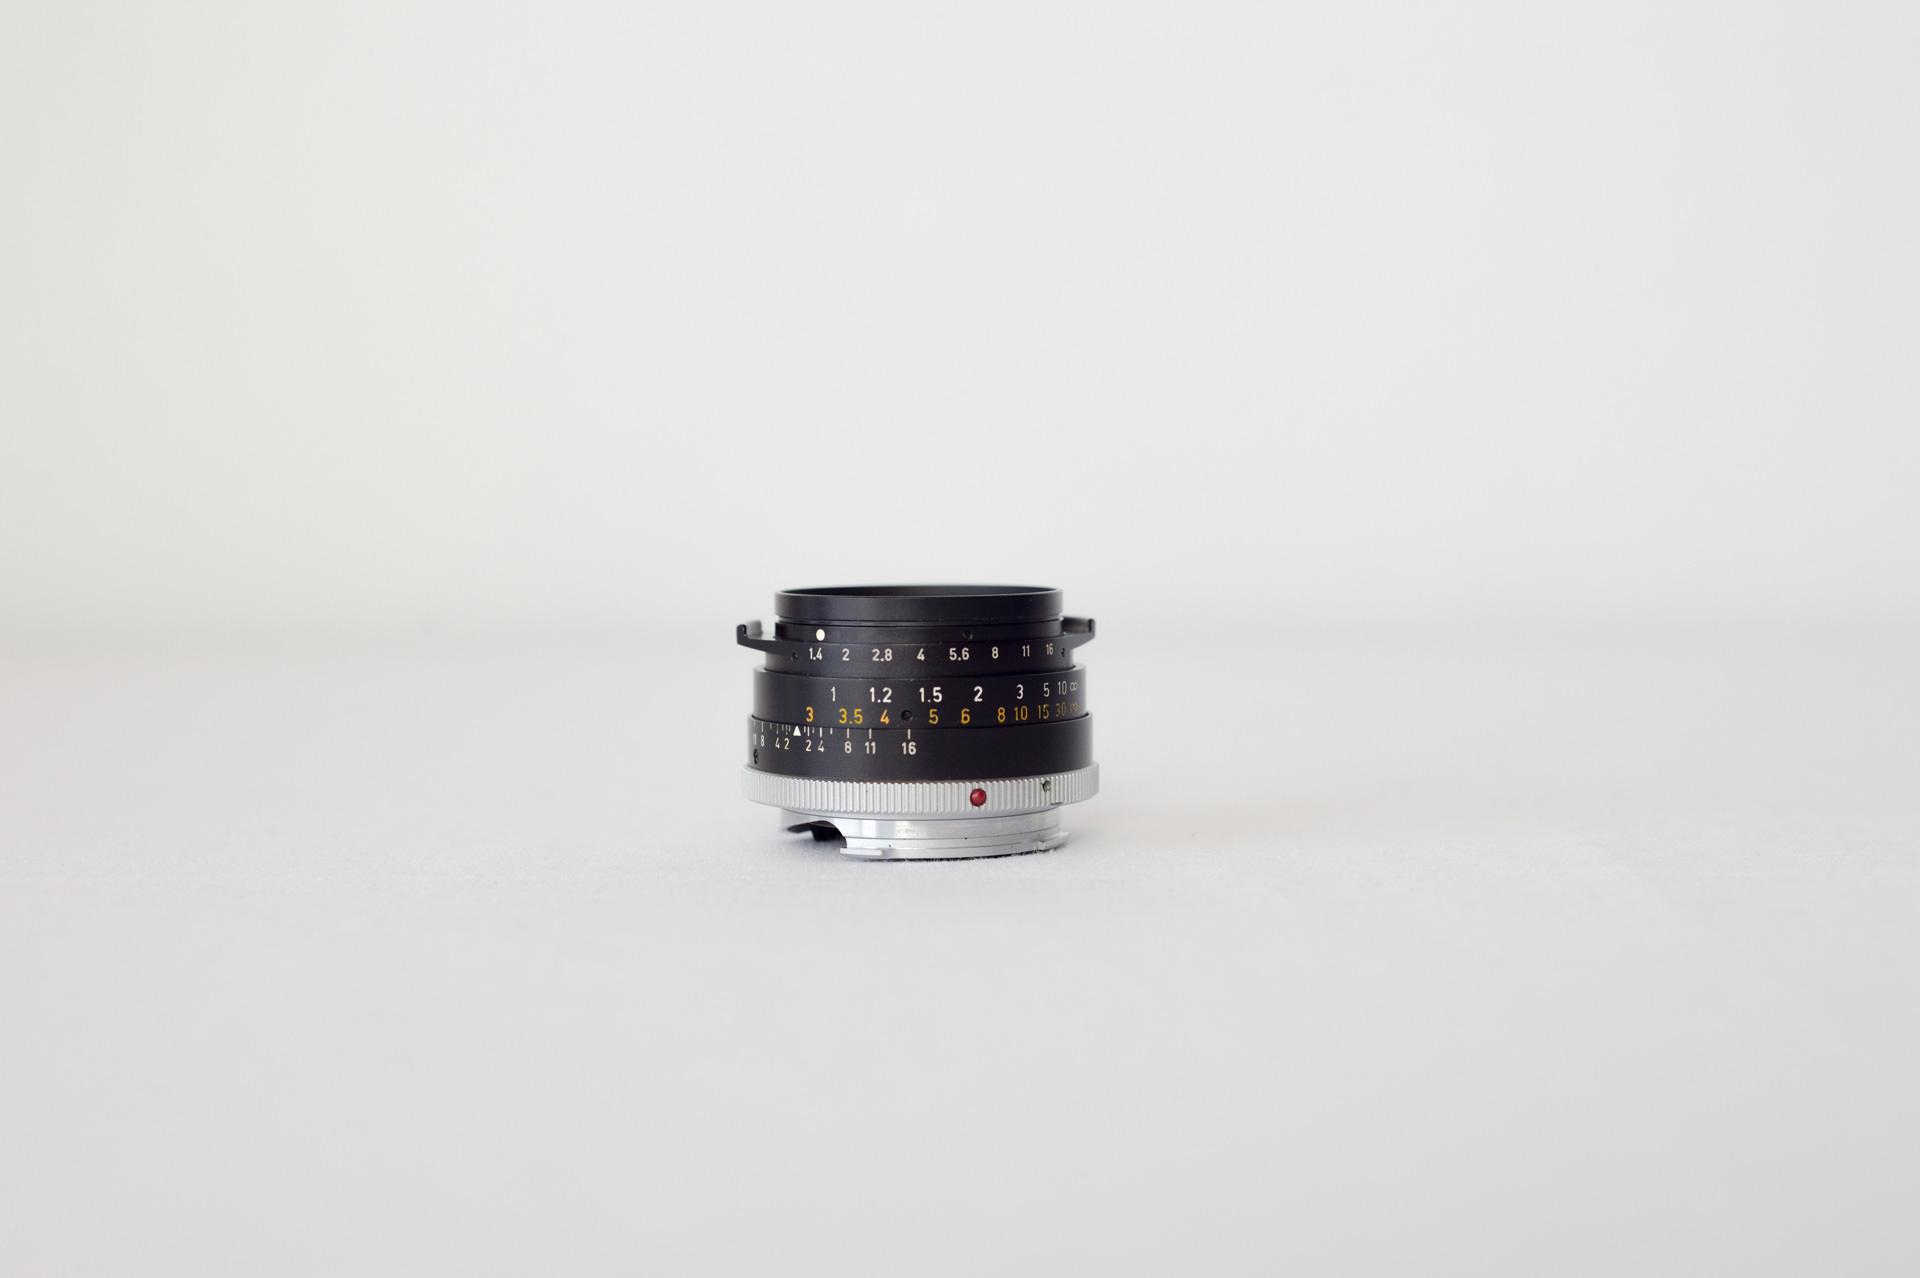 Leica Summilux 35mm f1.4 2nd